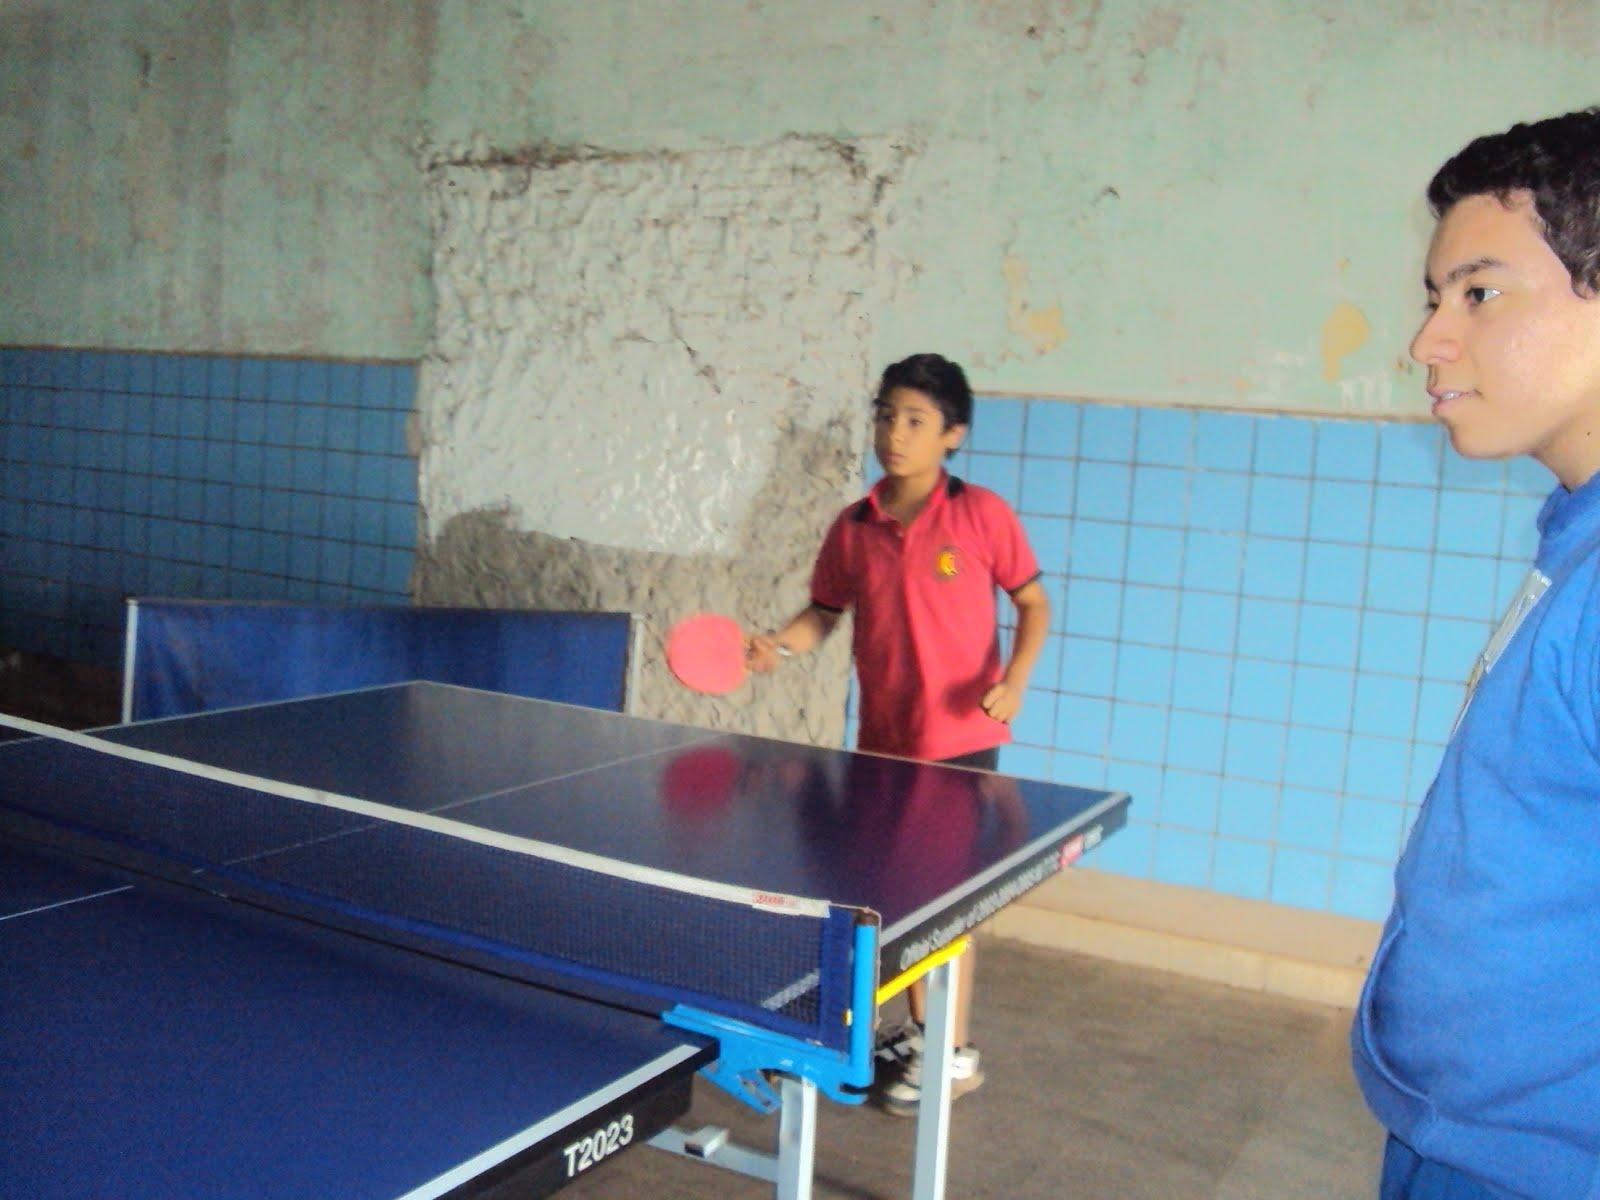 Torneo de tenis de mesa en el taller 2015